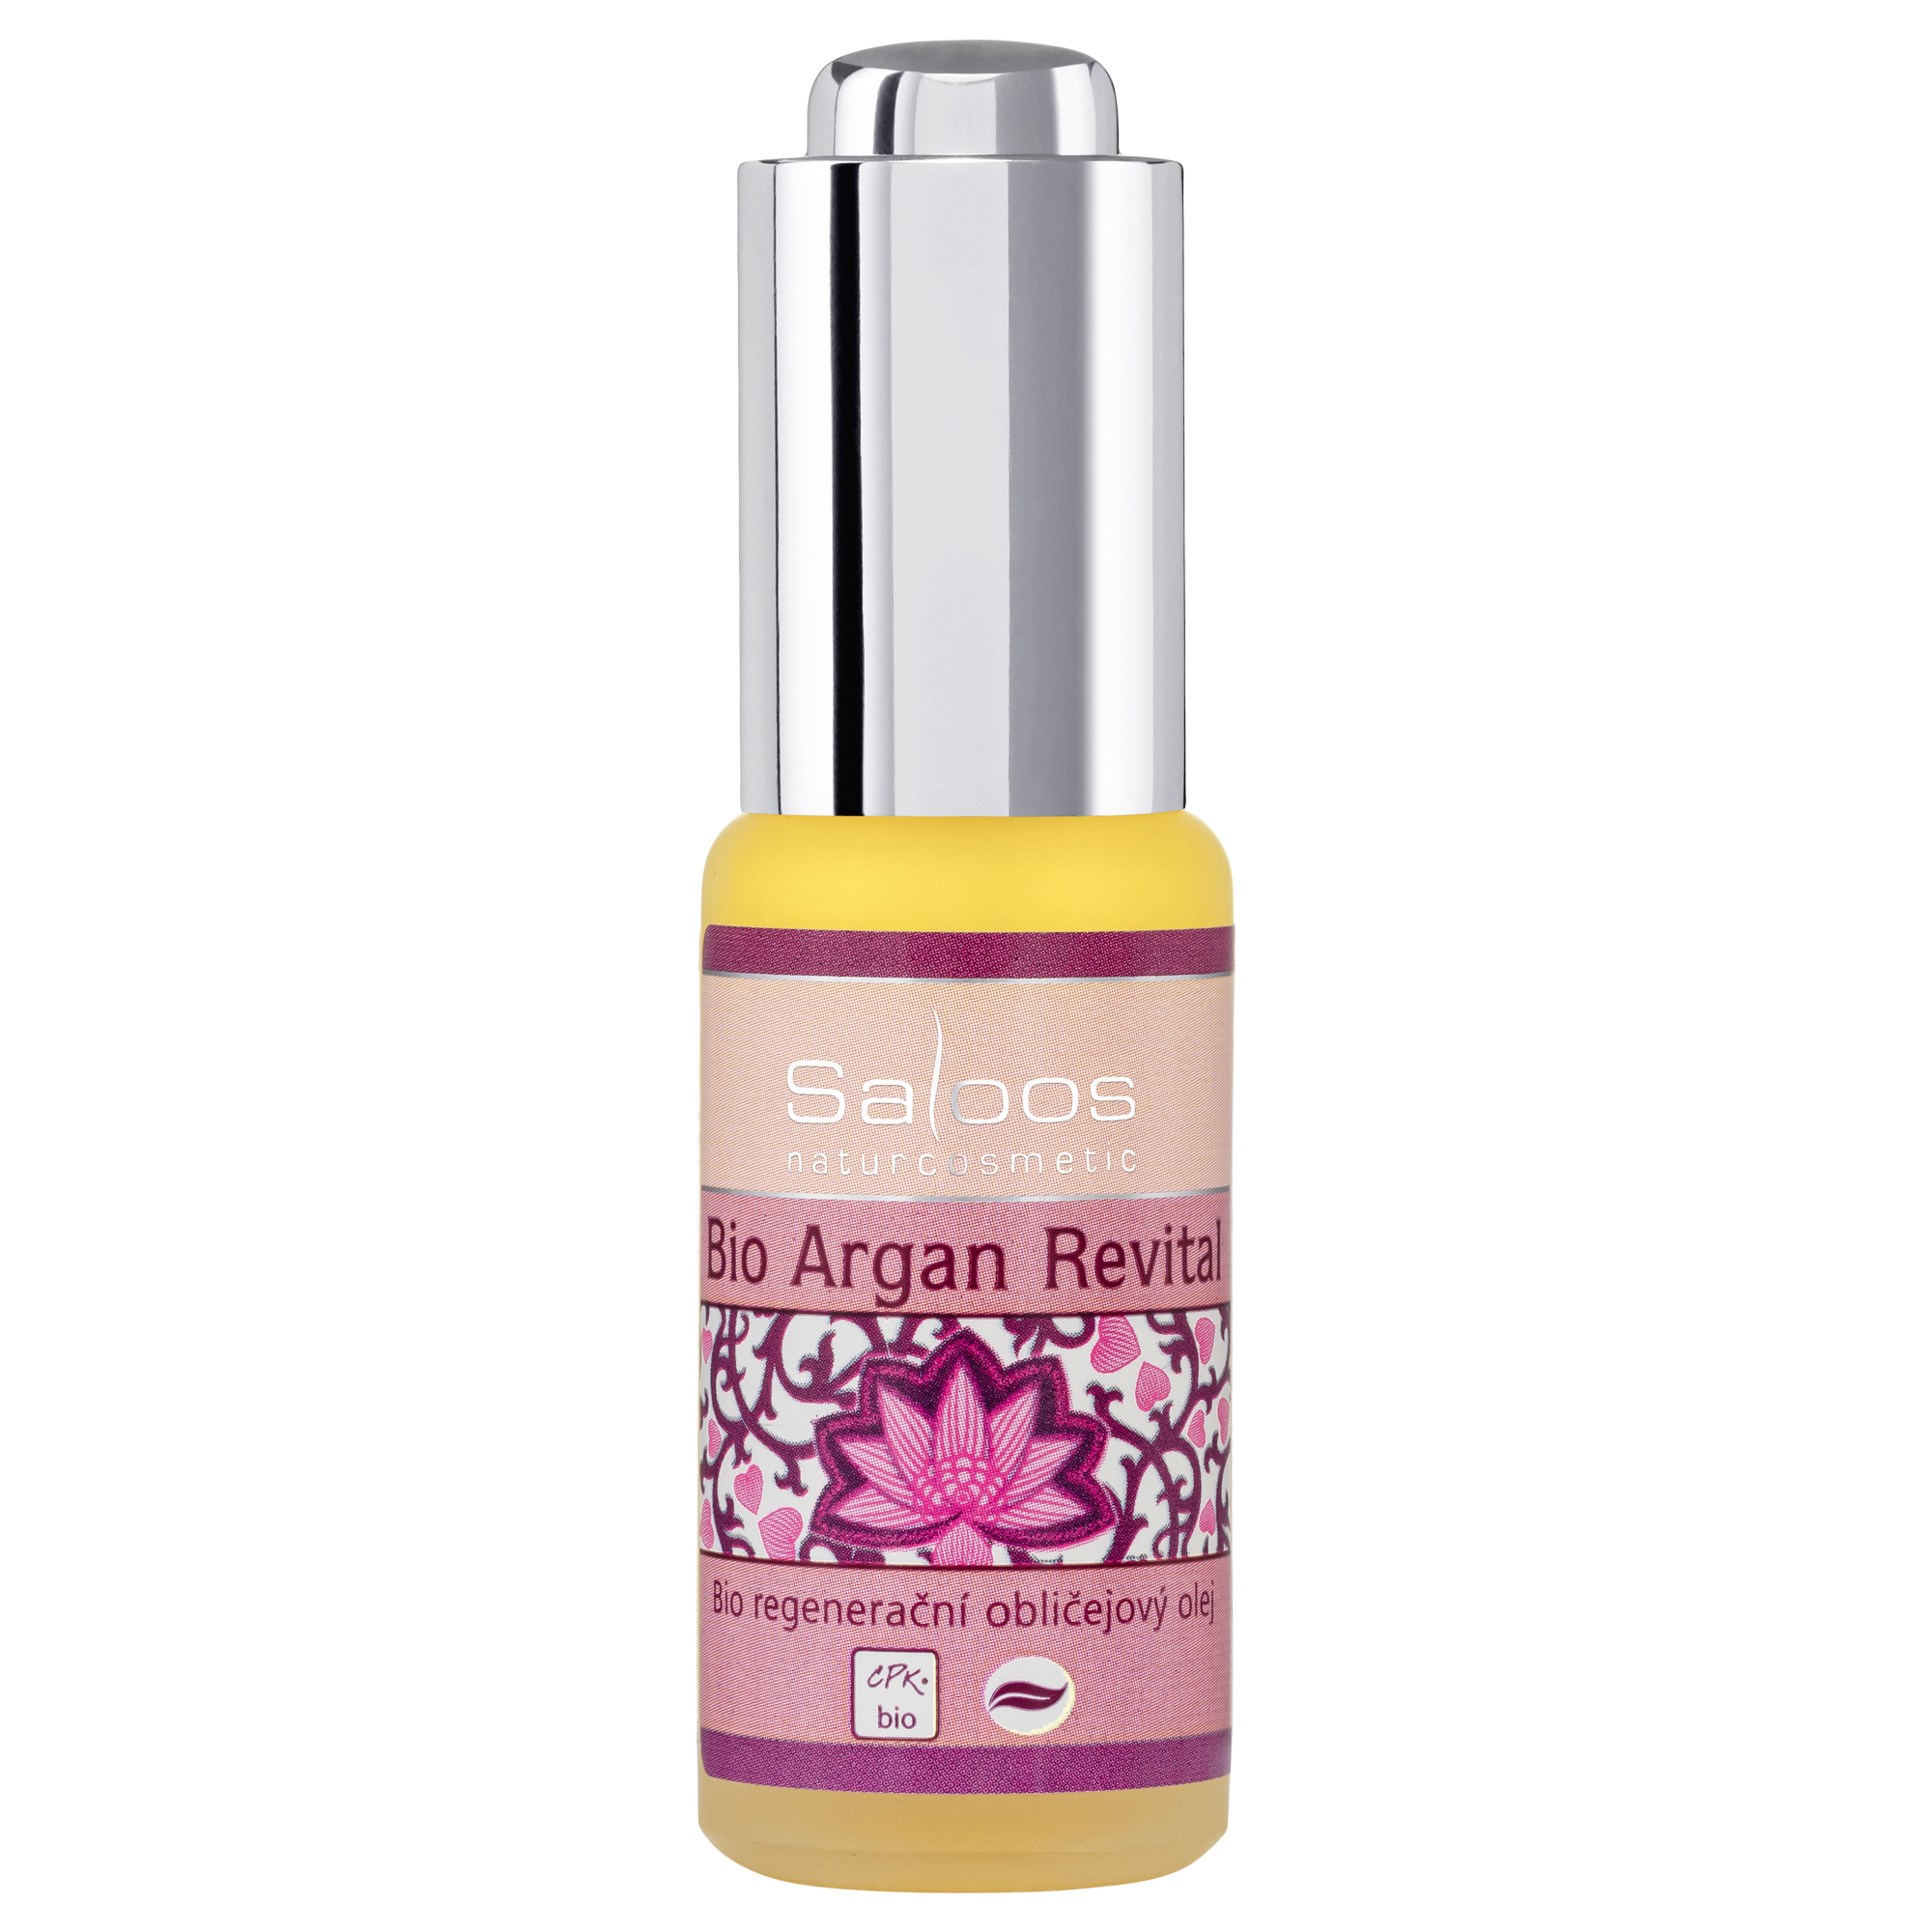 Regenerační obličejový olej BIO ARGAN REVITAL 20ml Saloos